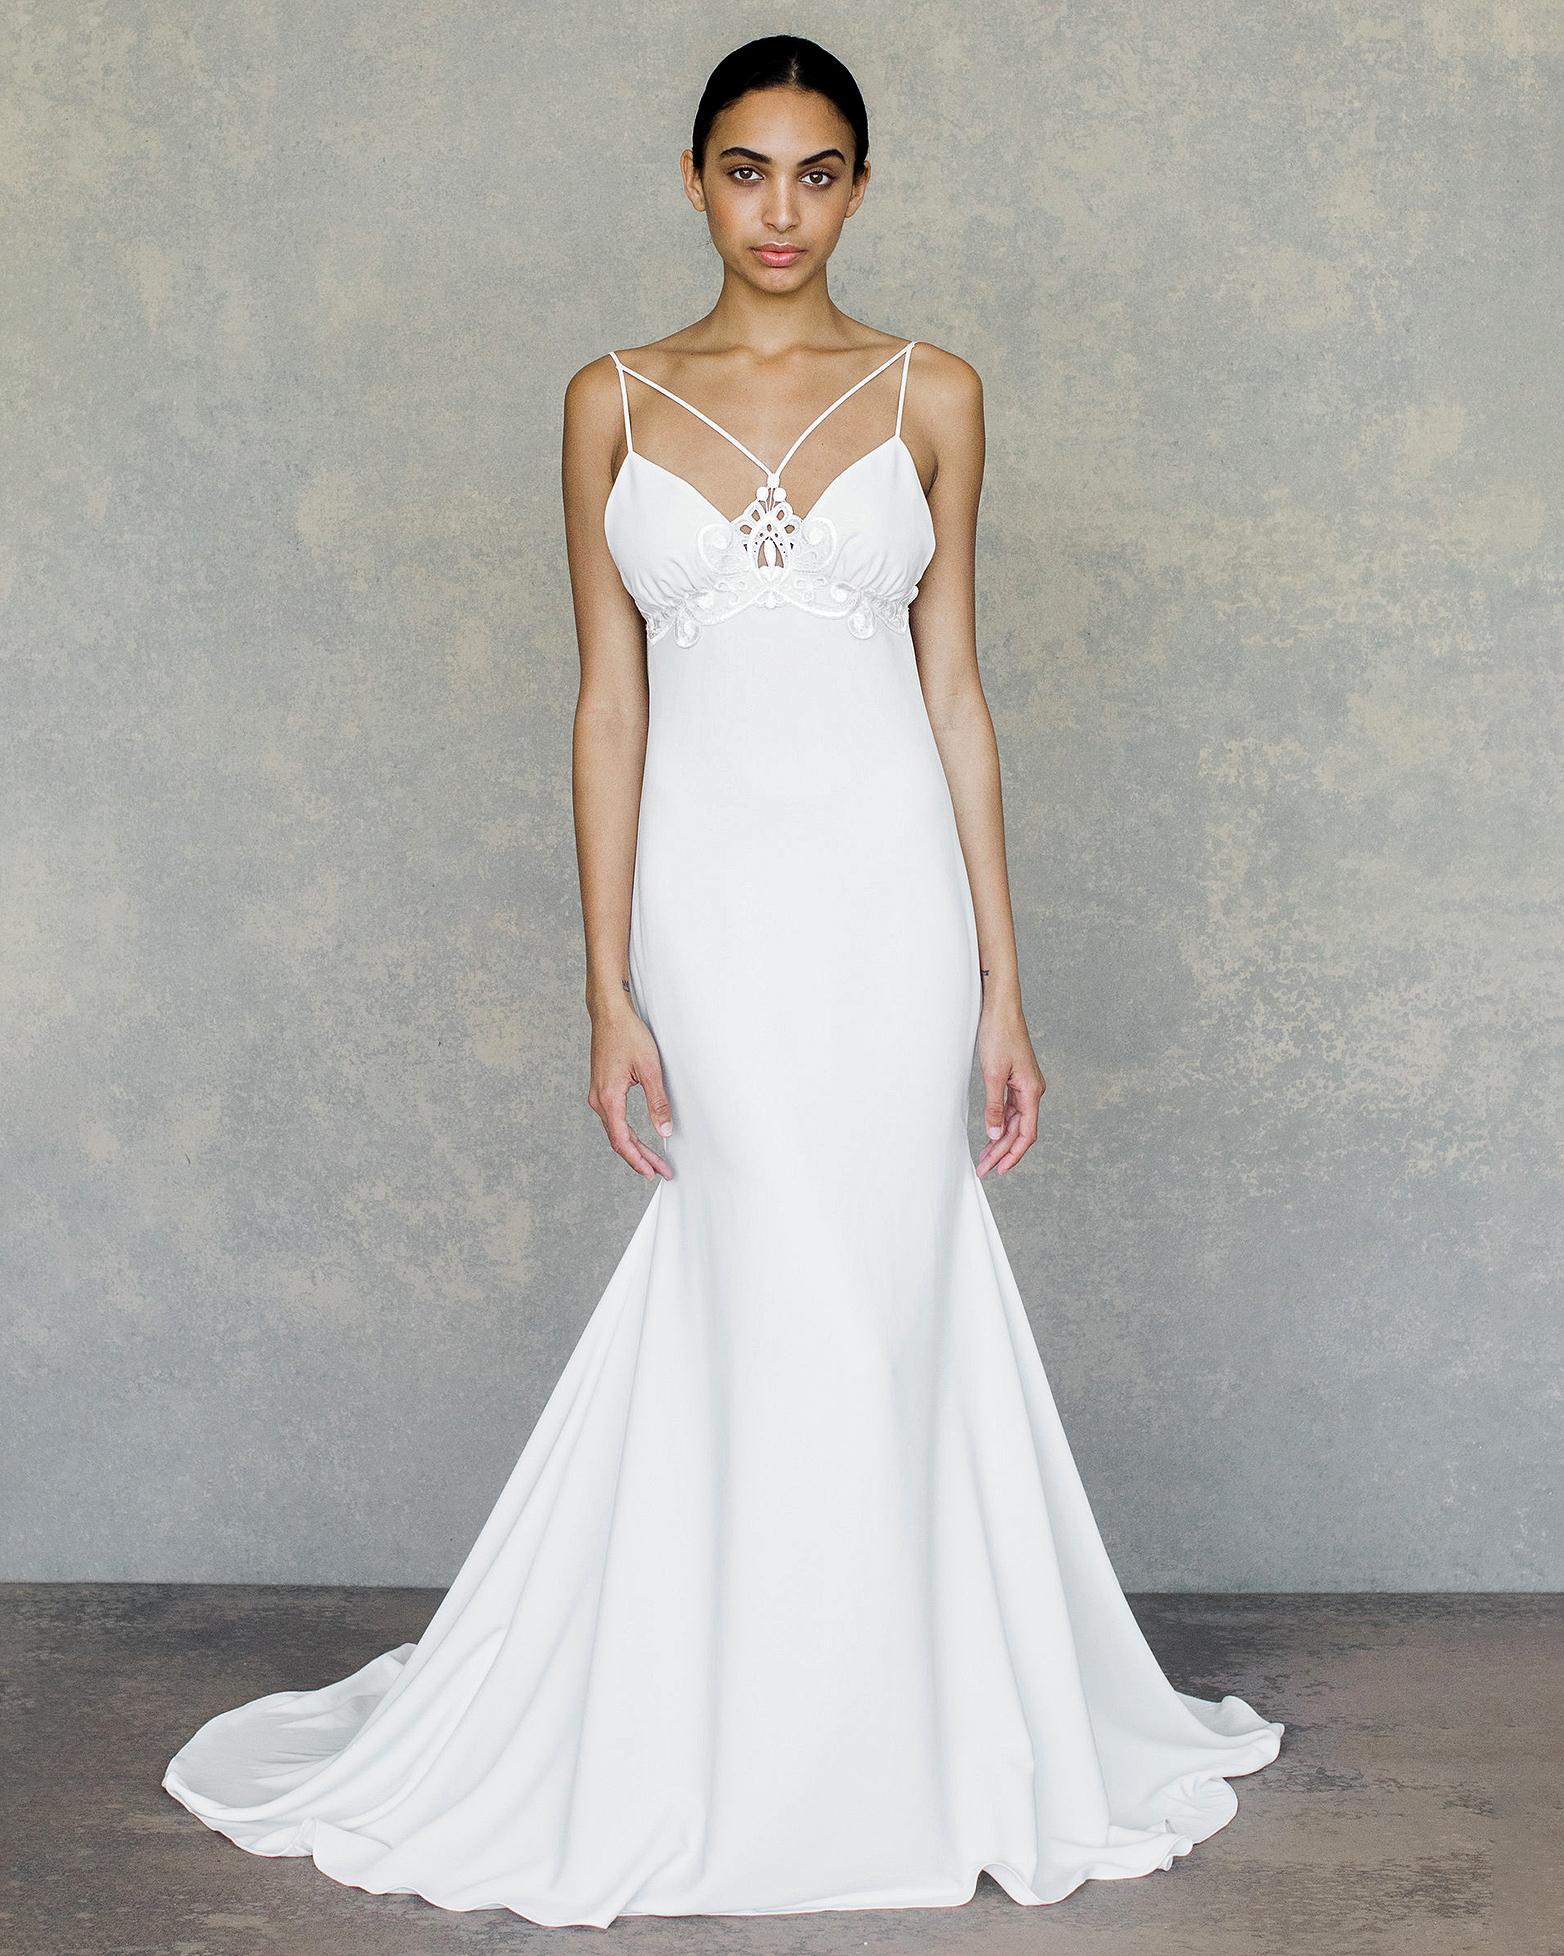 claire pettibone wedding dress spring 2019 strappy bust detail trumpet